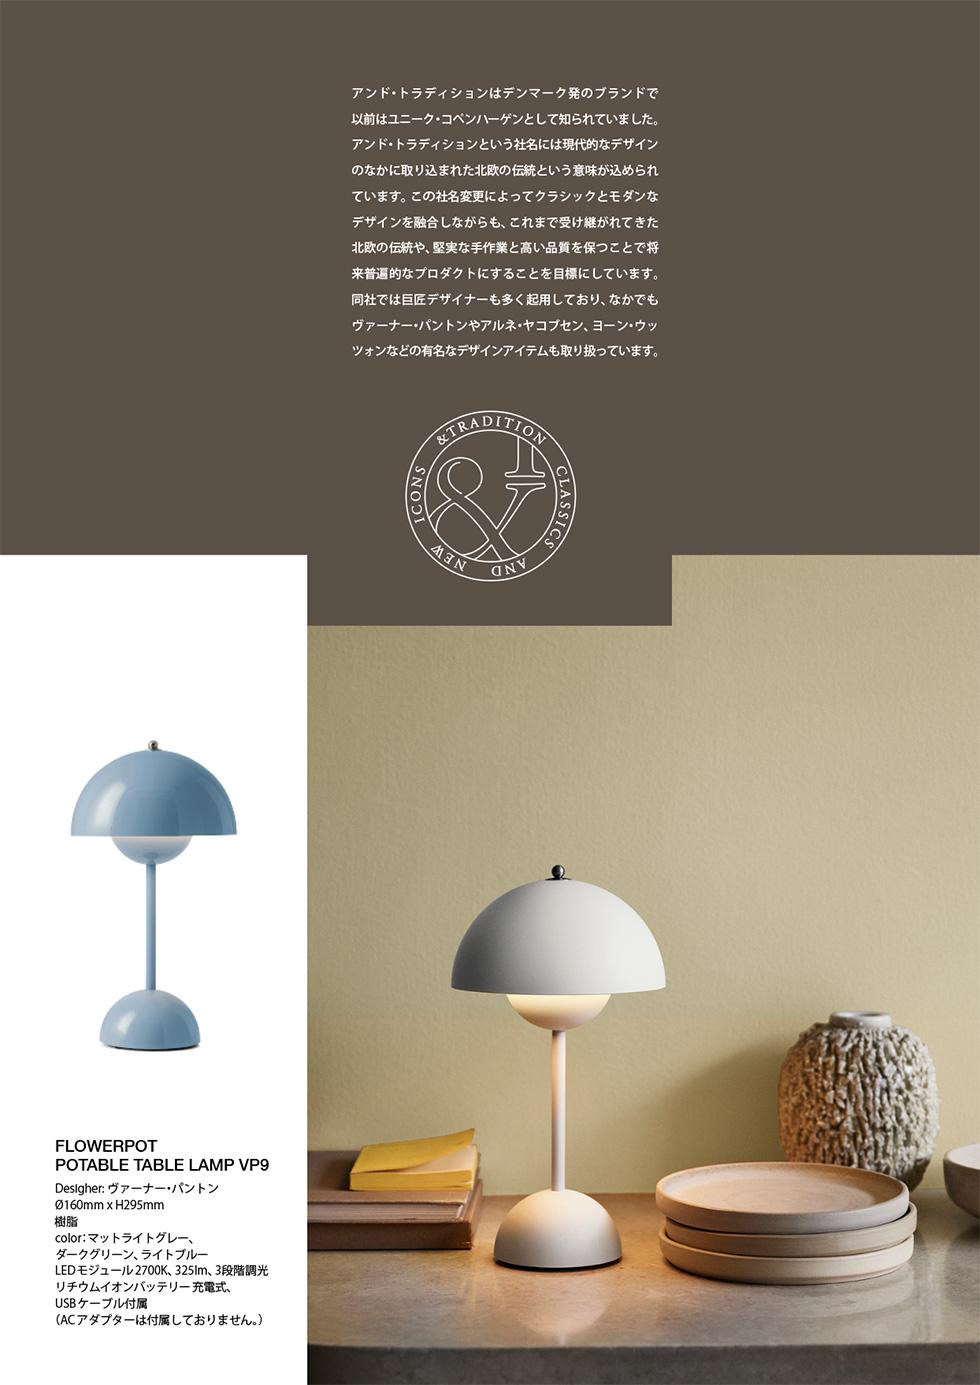 FLOWERPOT POTABLE TABLE LAMP VP9